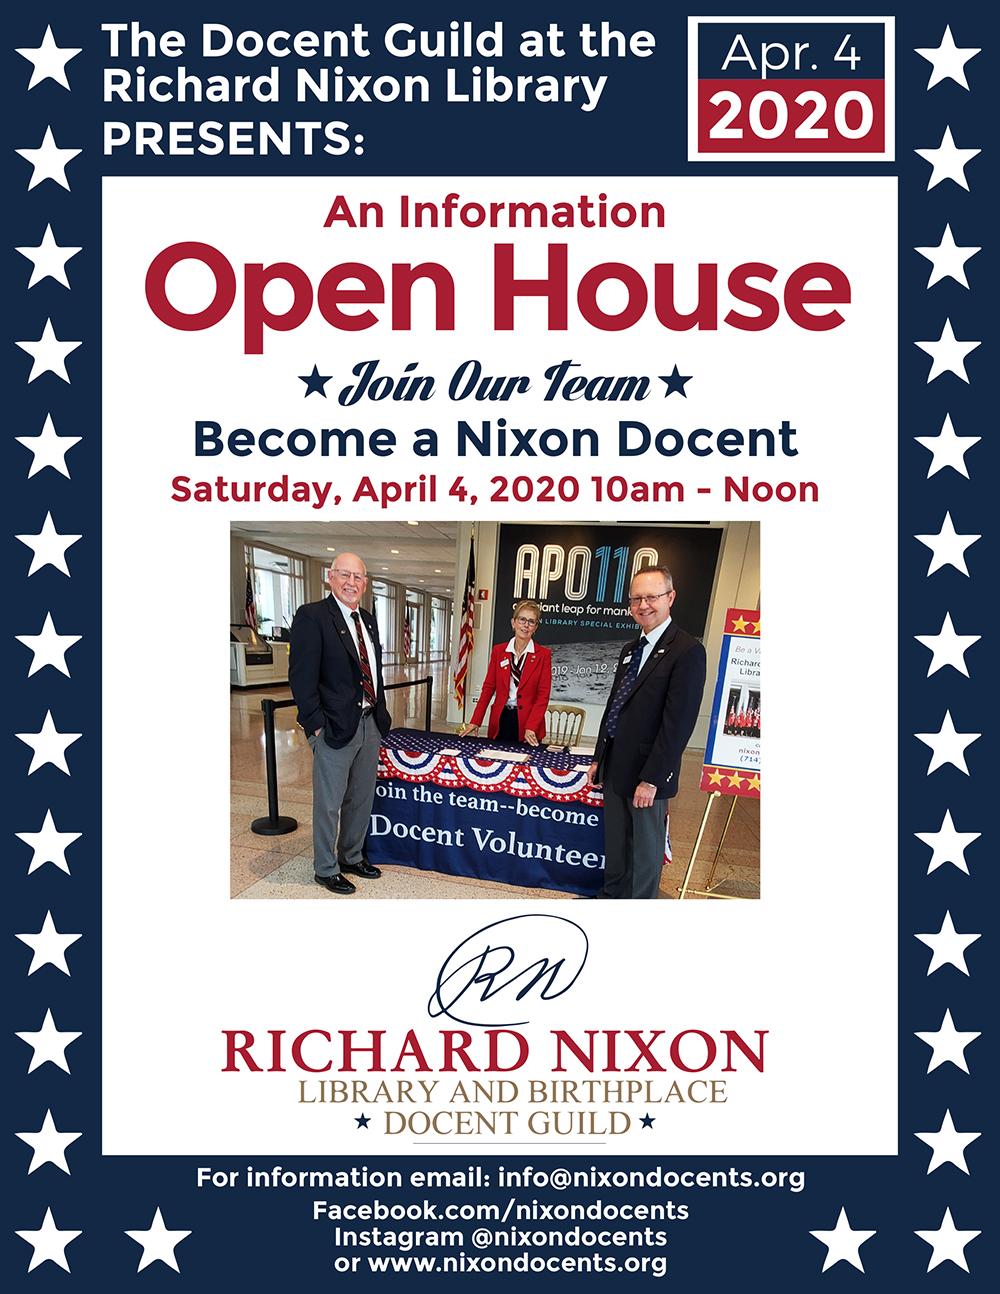 Graphic Design for the Nixon Library in Orange County